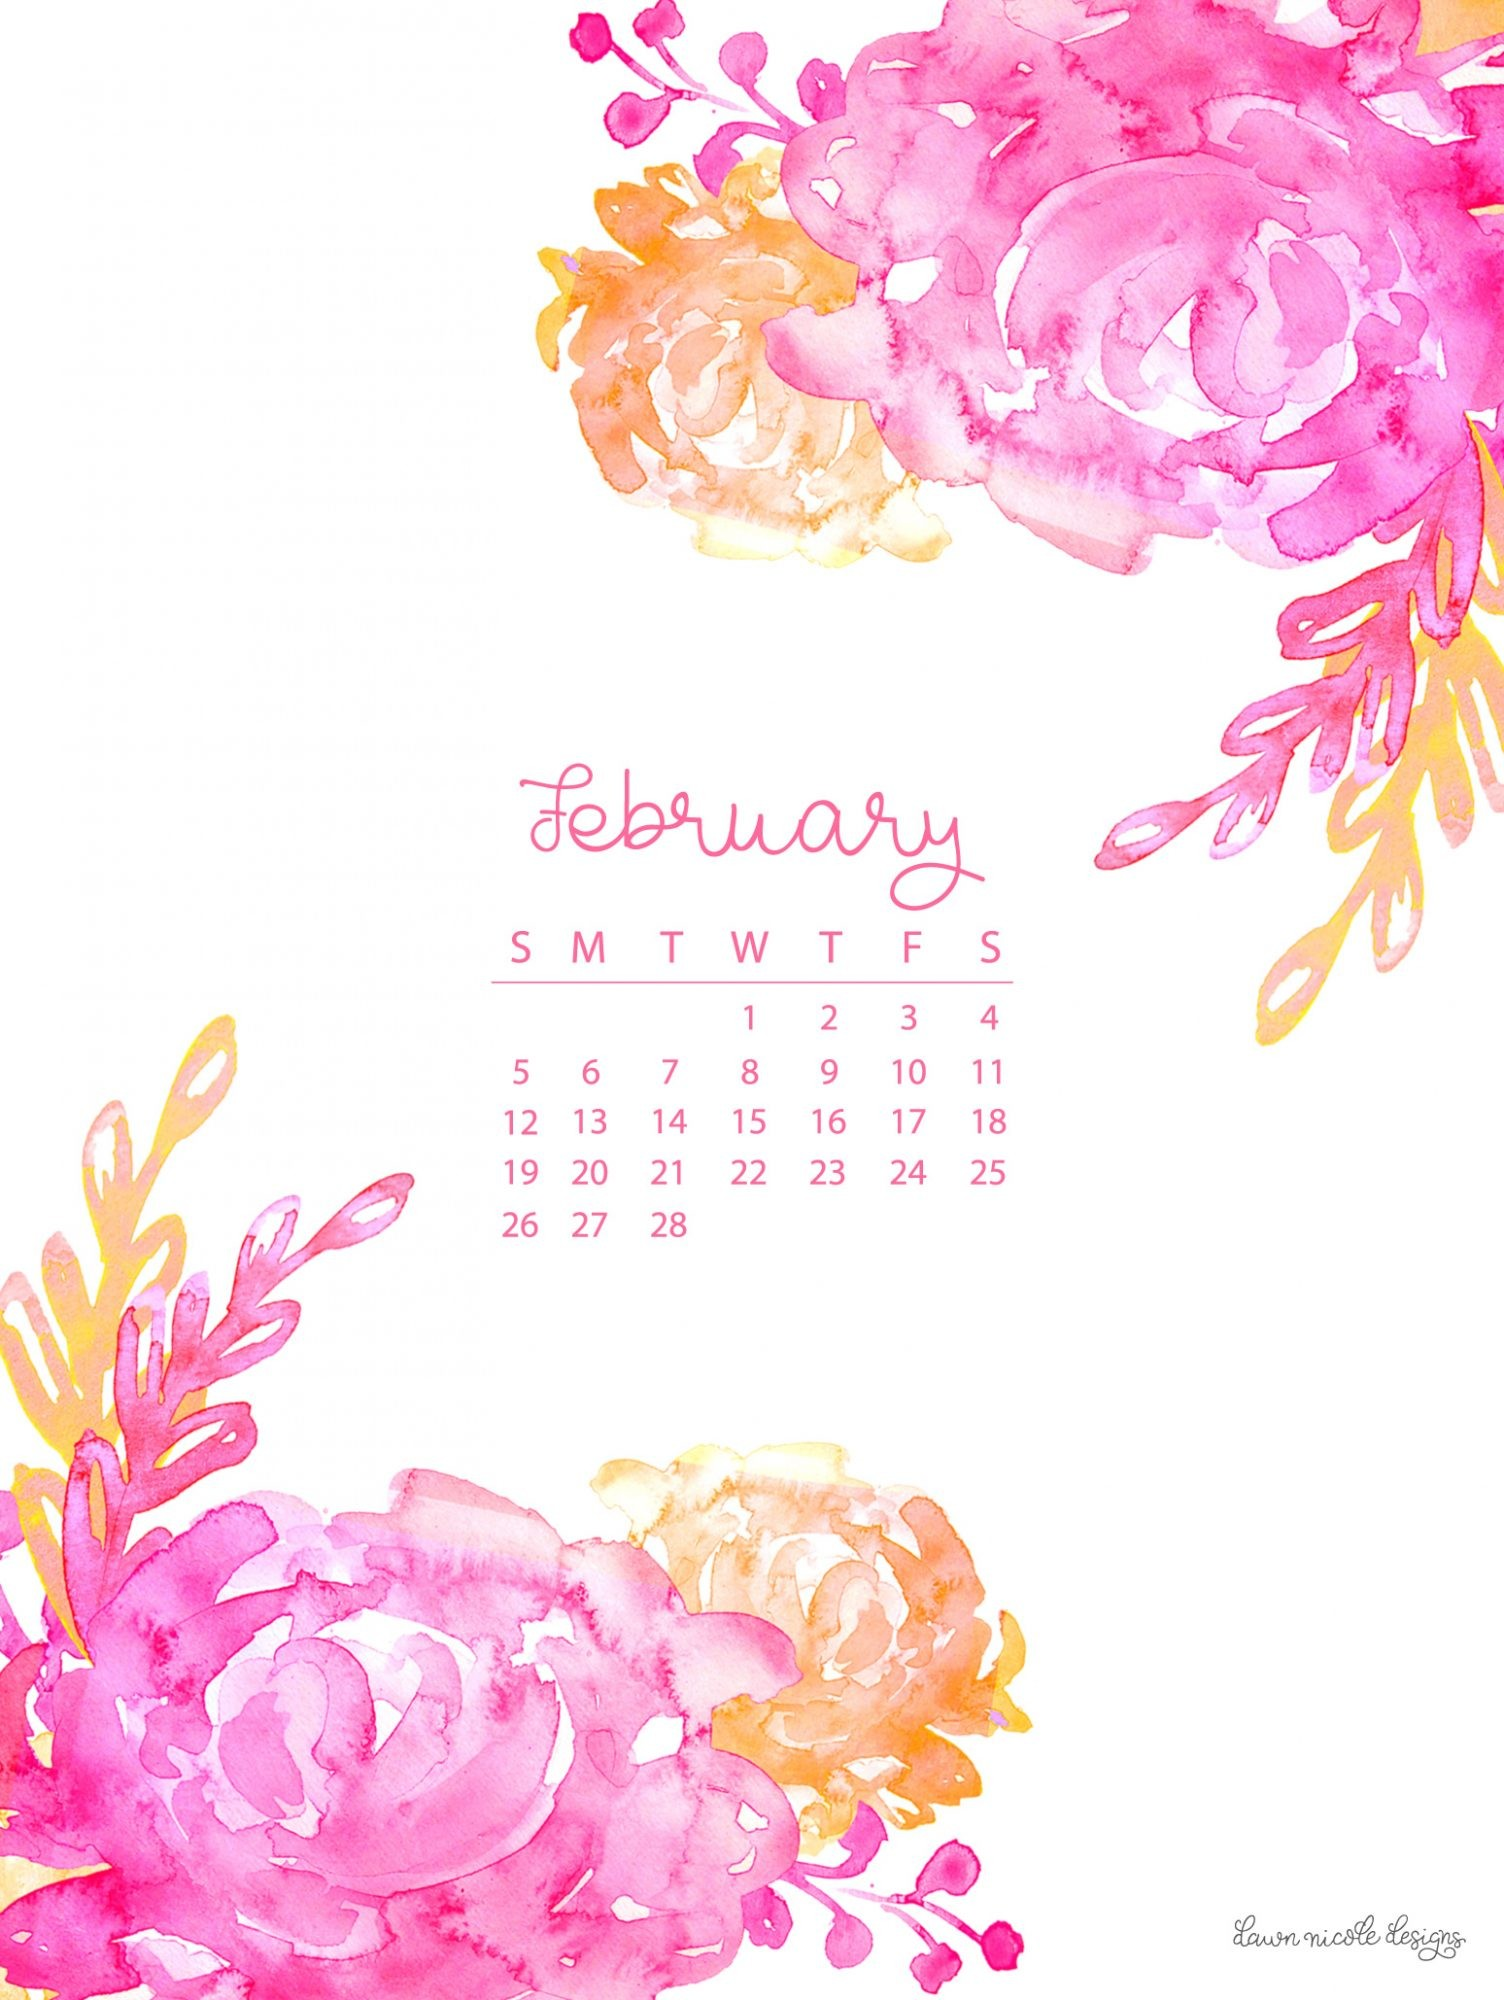 Desktop Calendar Wallpaper With Reminder : February wallpaper calendar images